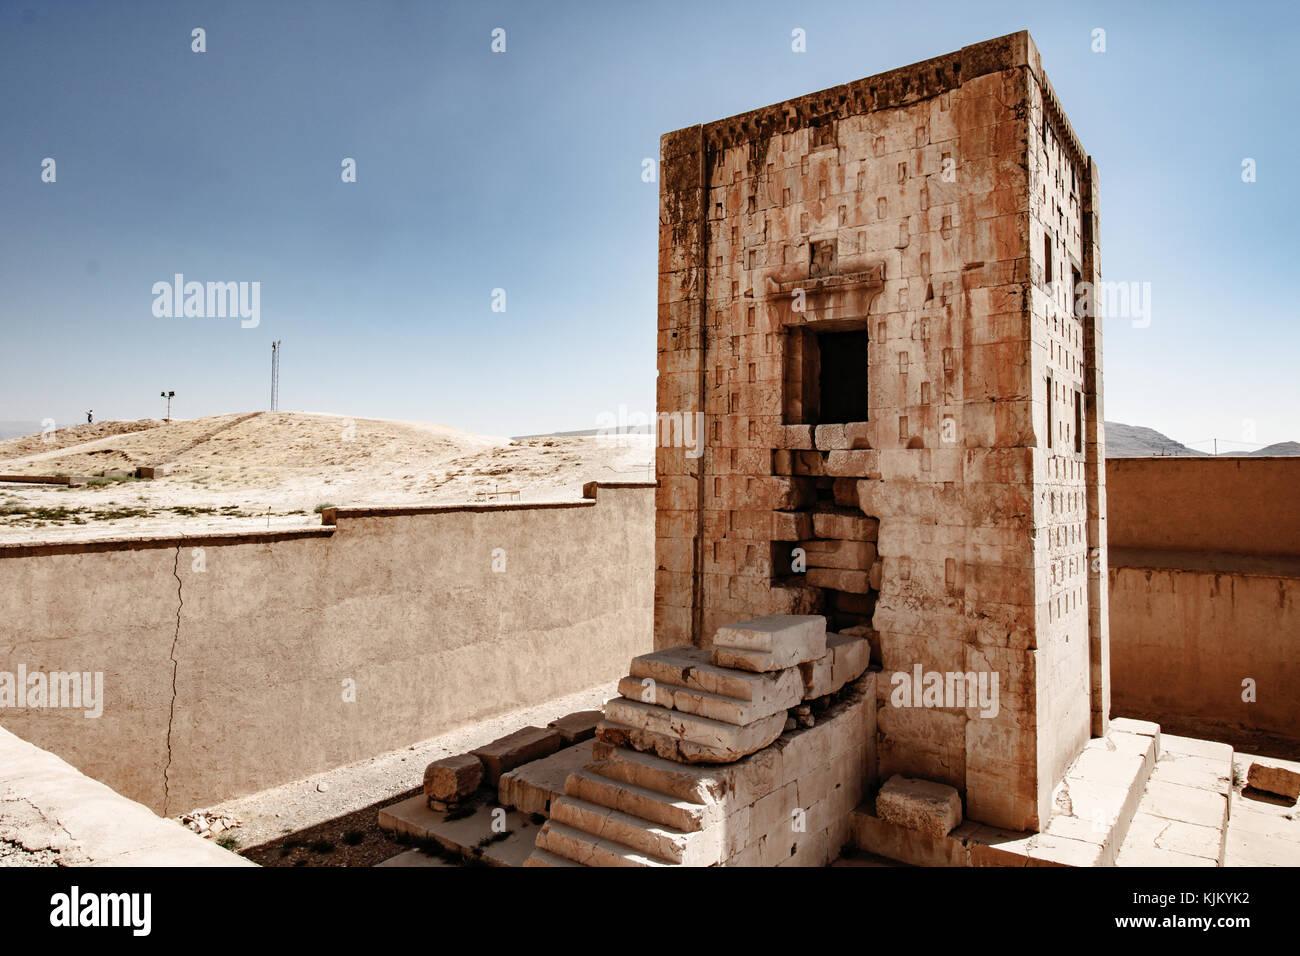 Zoroastrian temple of fire in Naqsh-E Rostam Stock Photo